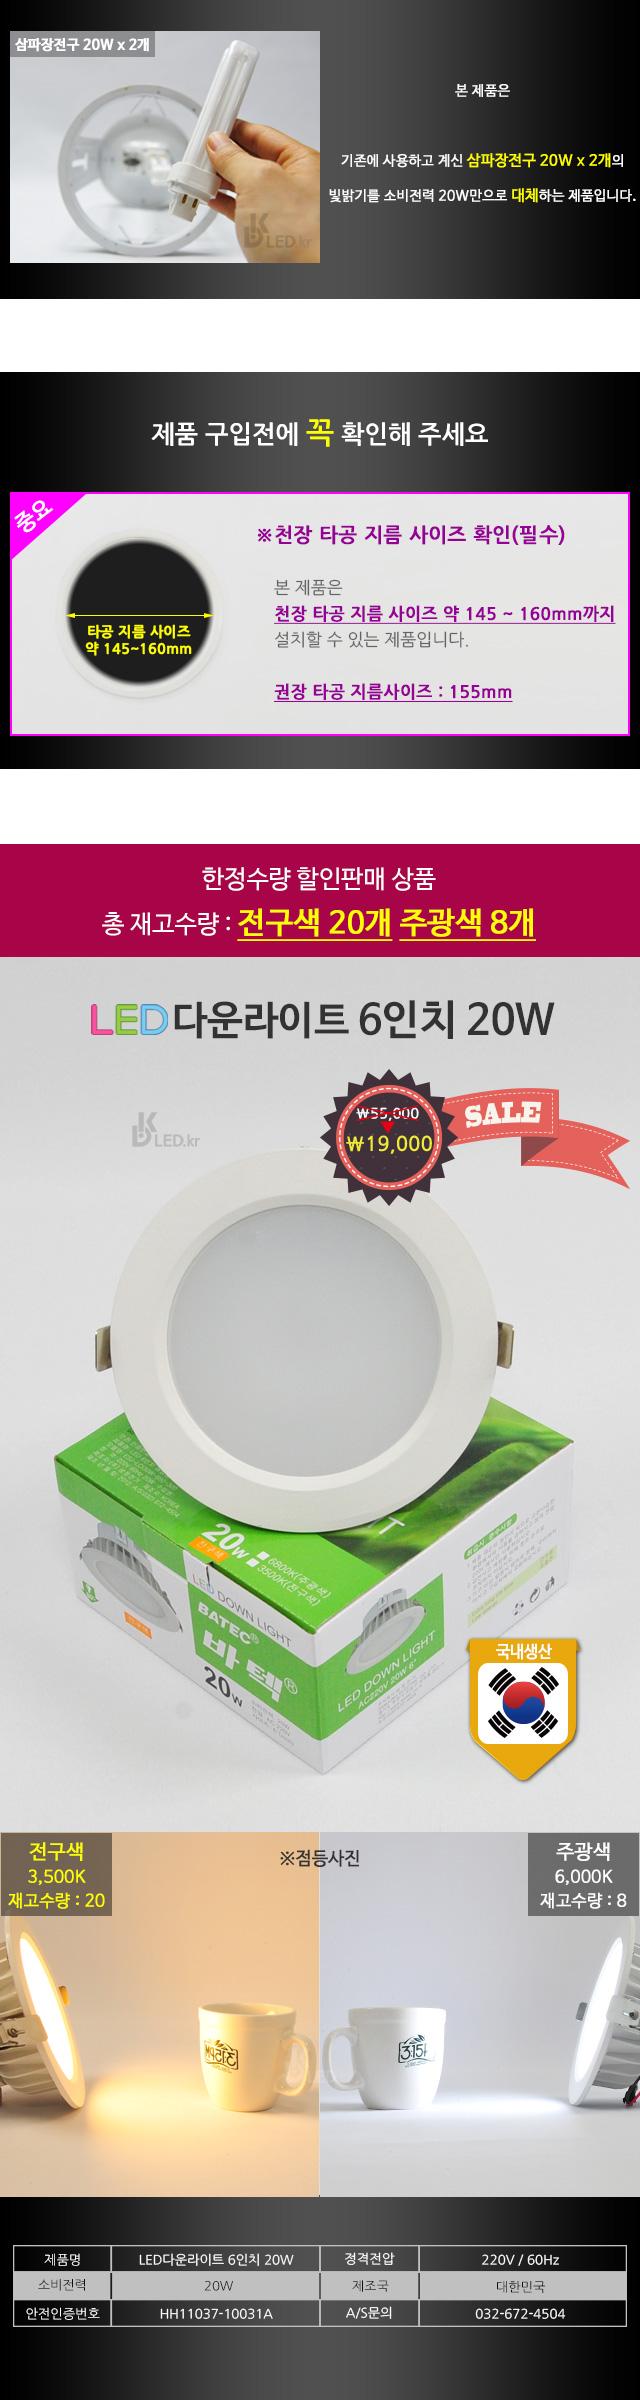 LED다운라이트